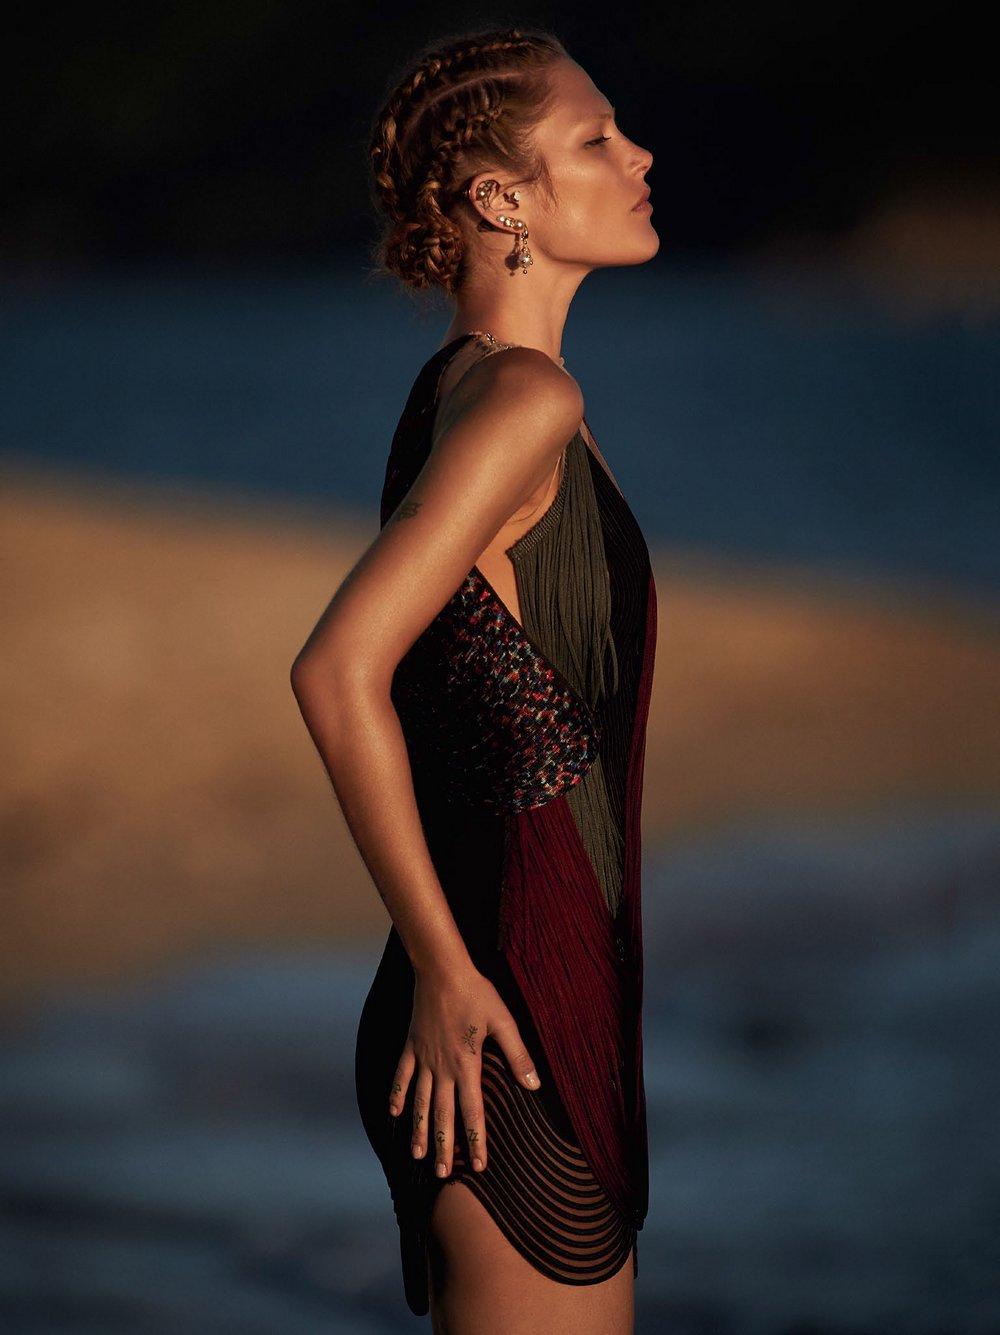 Catherine-McNeil-by-Gilles-Bensimon-for-Vogue-Australia-October-2014-9.jpg